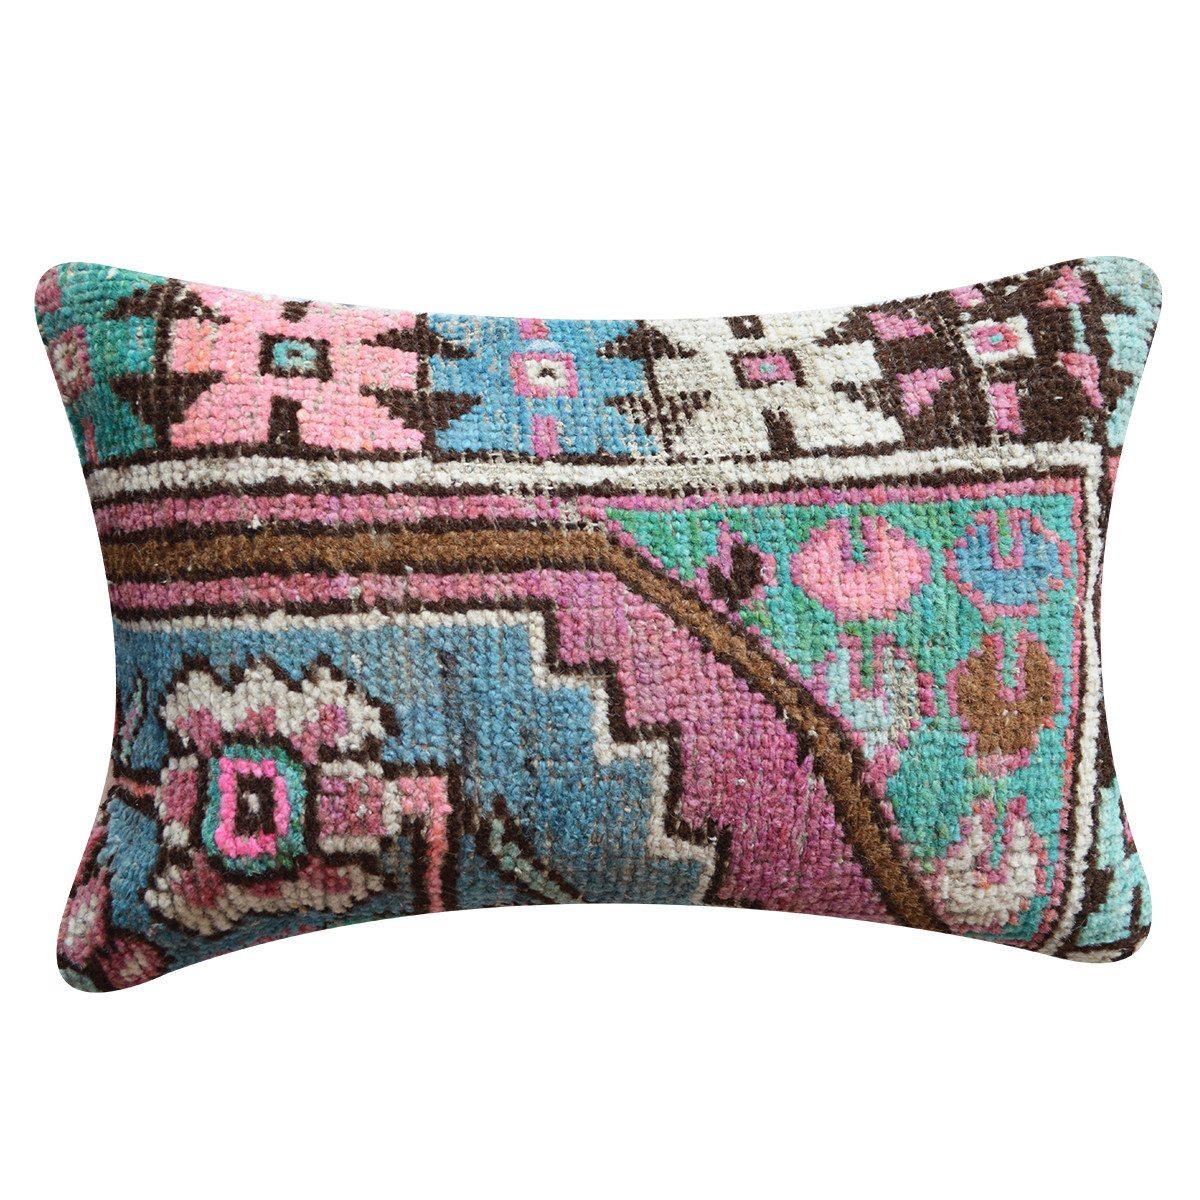 2-pillow-shopceladon